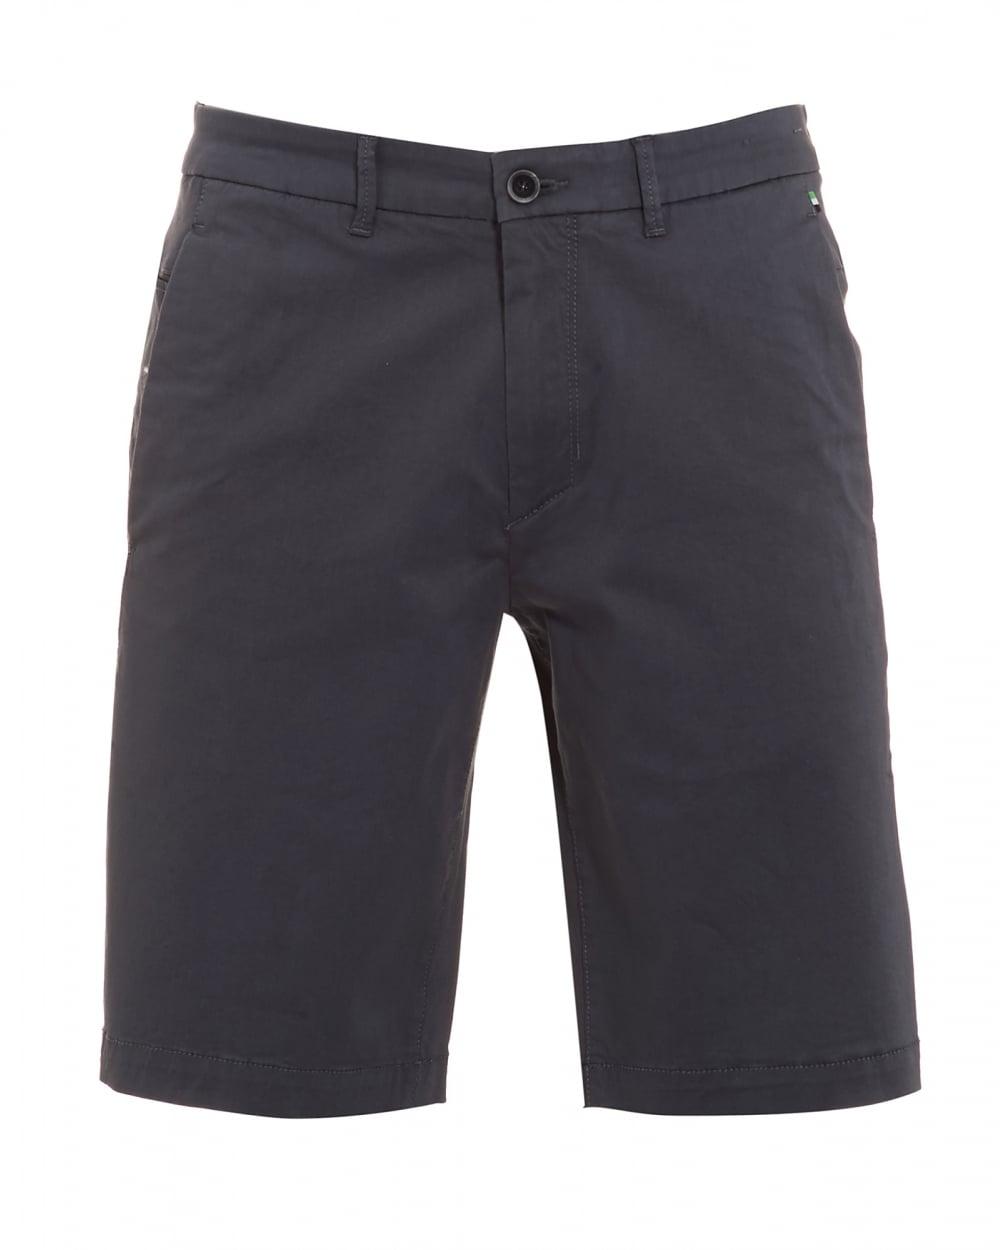 Mens Liem 2 Shorts, Stretch Cotton Grey Short